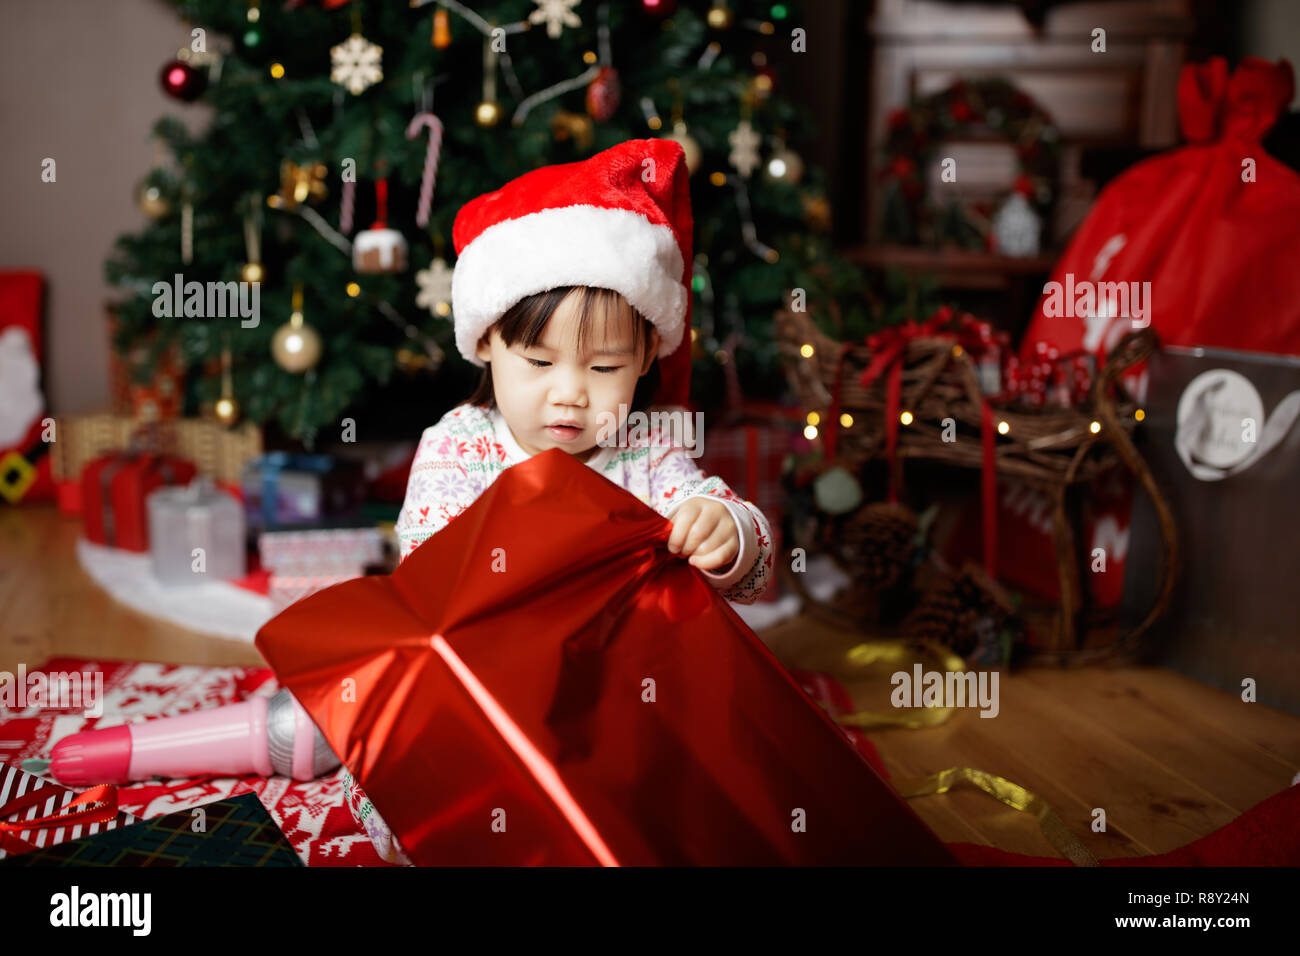 Toddler Christmas Tree Costume.Toddler Baby Girl Wearing Santa Claus Costume Open Gift Box